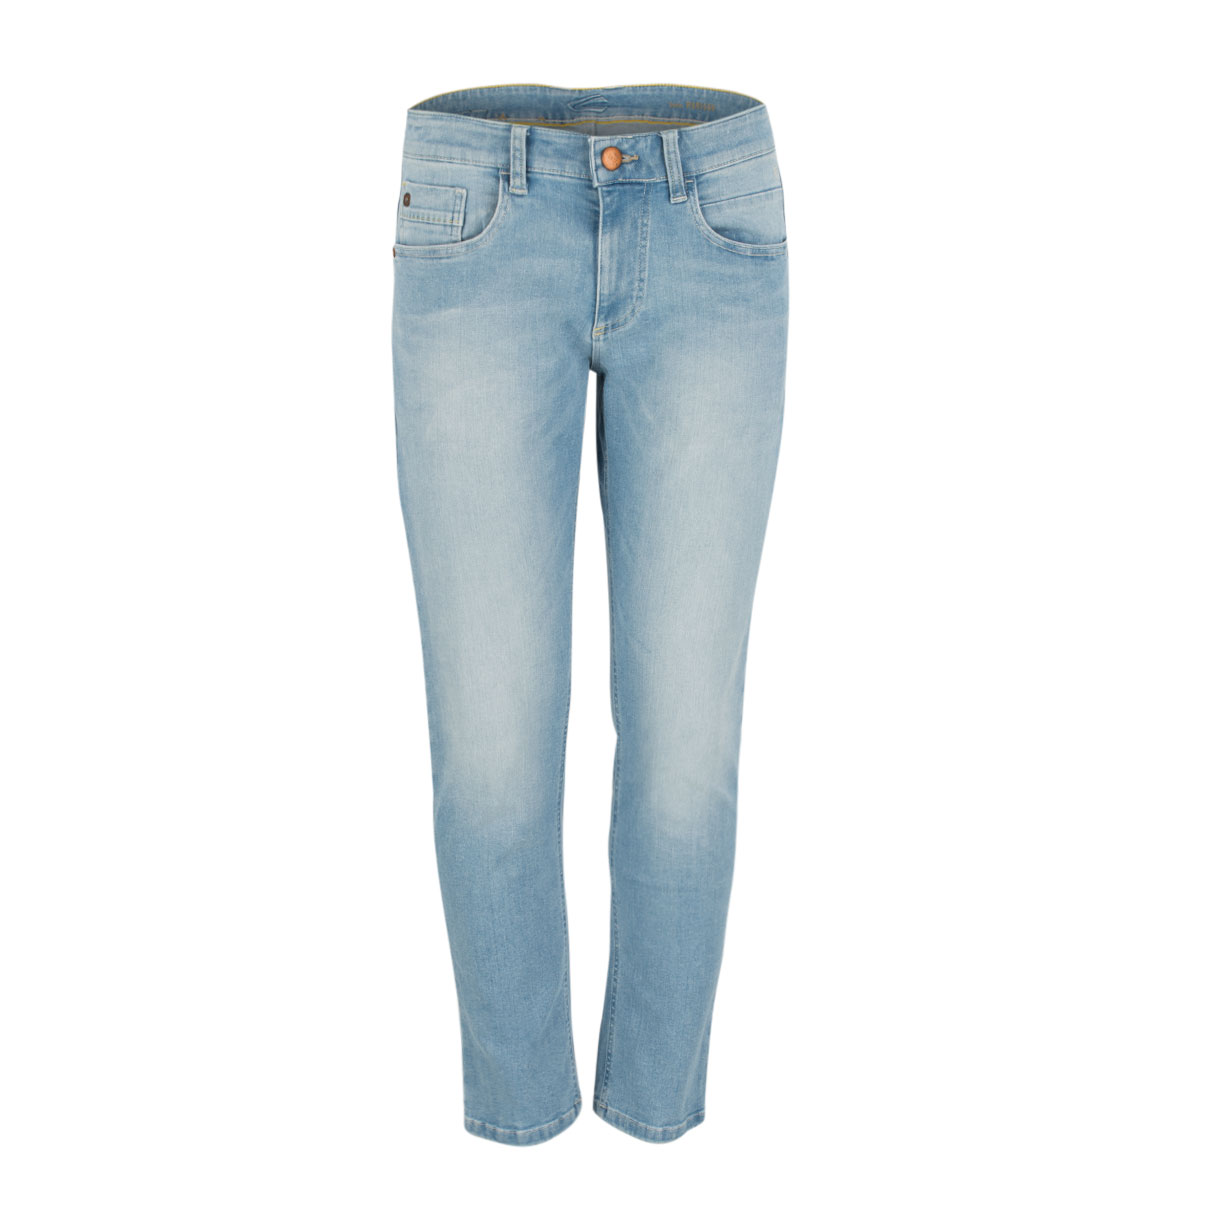 jeans madison straight fit flex von camel active. Black Bedroom Furniture Sets. Home Design Ideas